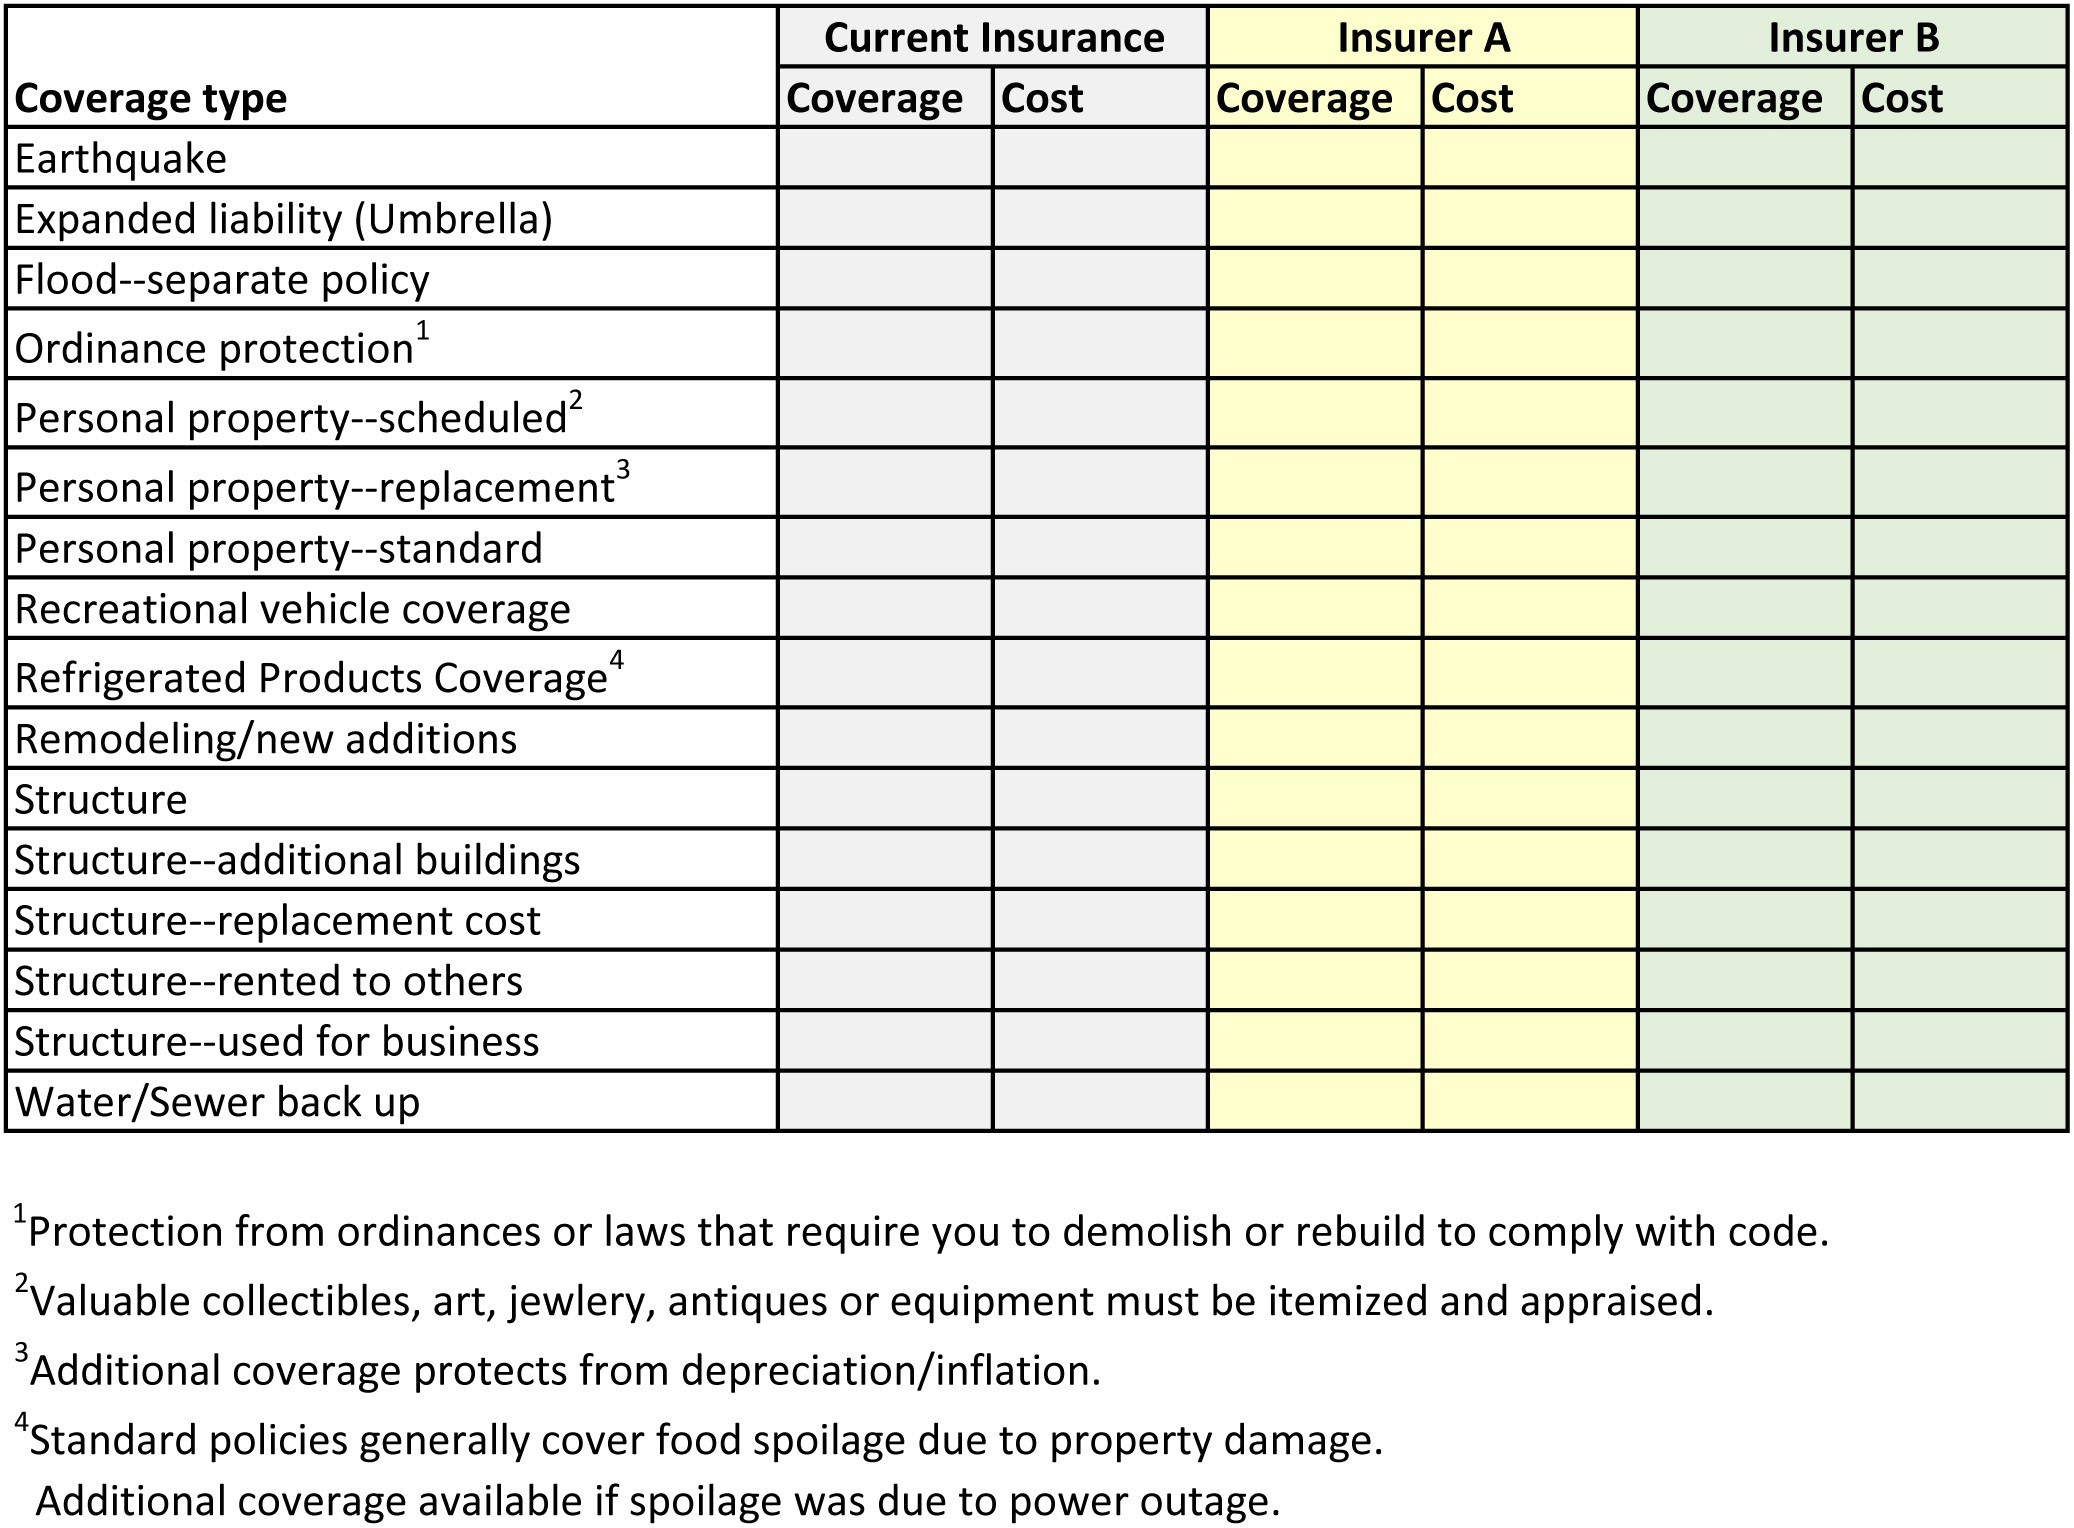 homeowners insurance cost calculator photo - 1